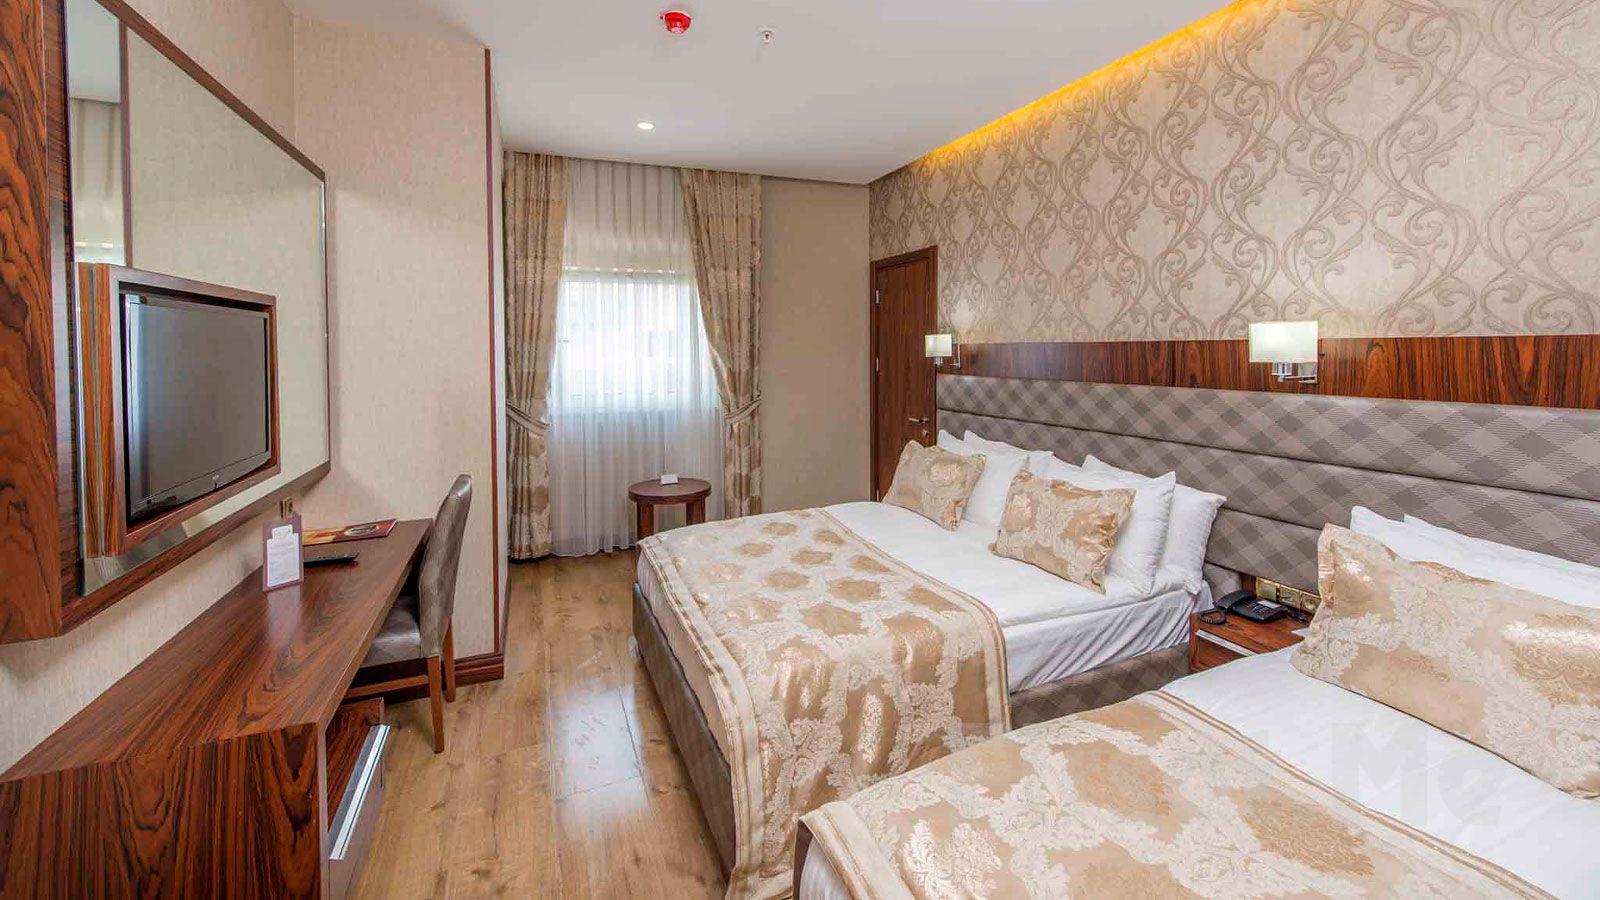 Yenibosna midmar deluxe hotel de standart odalarda for Midmar deluxe hotel